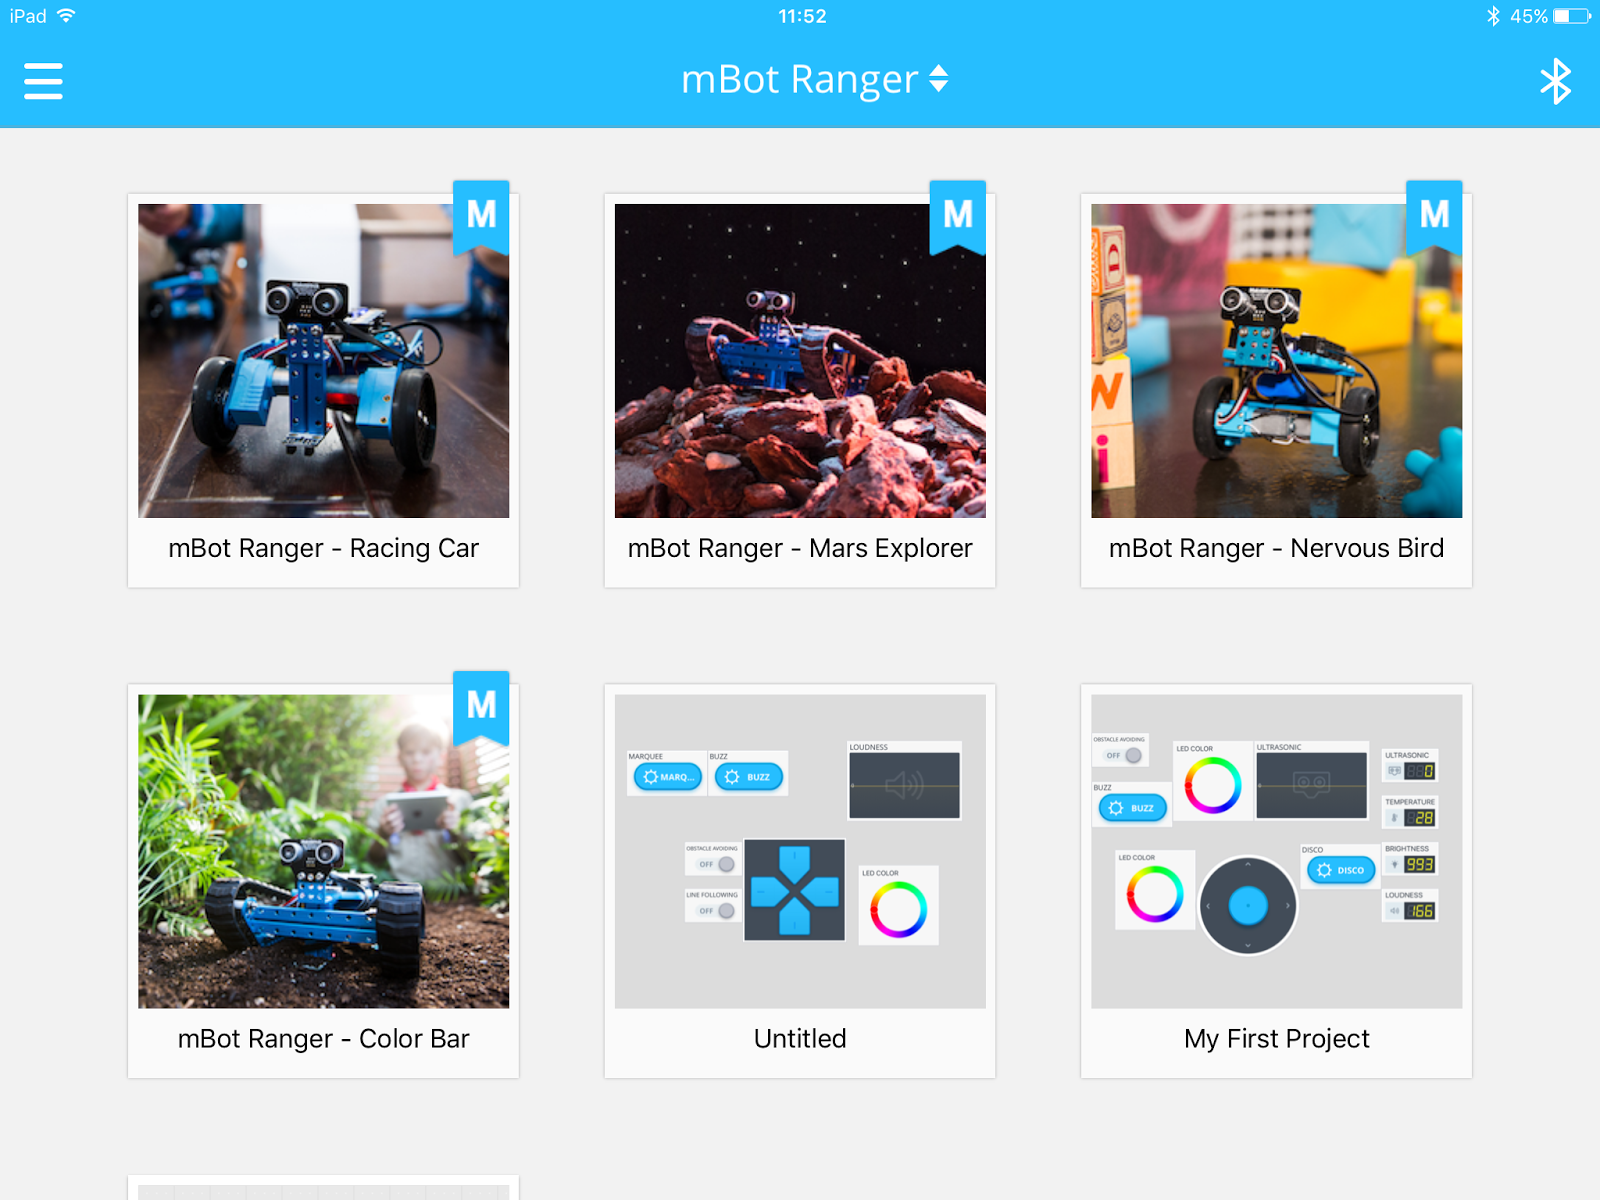 Makeblock mBot Ranger Programmable Robot Review | Tech Age Kids